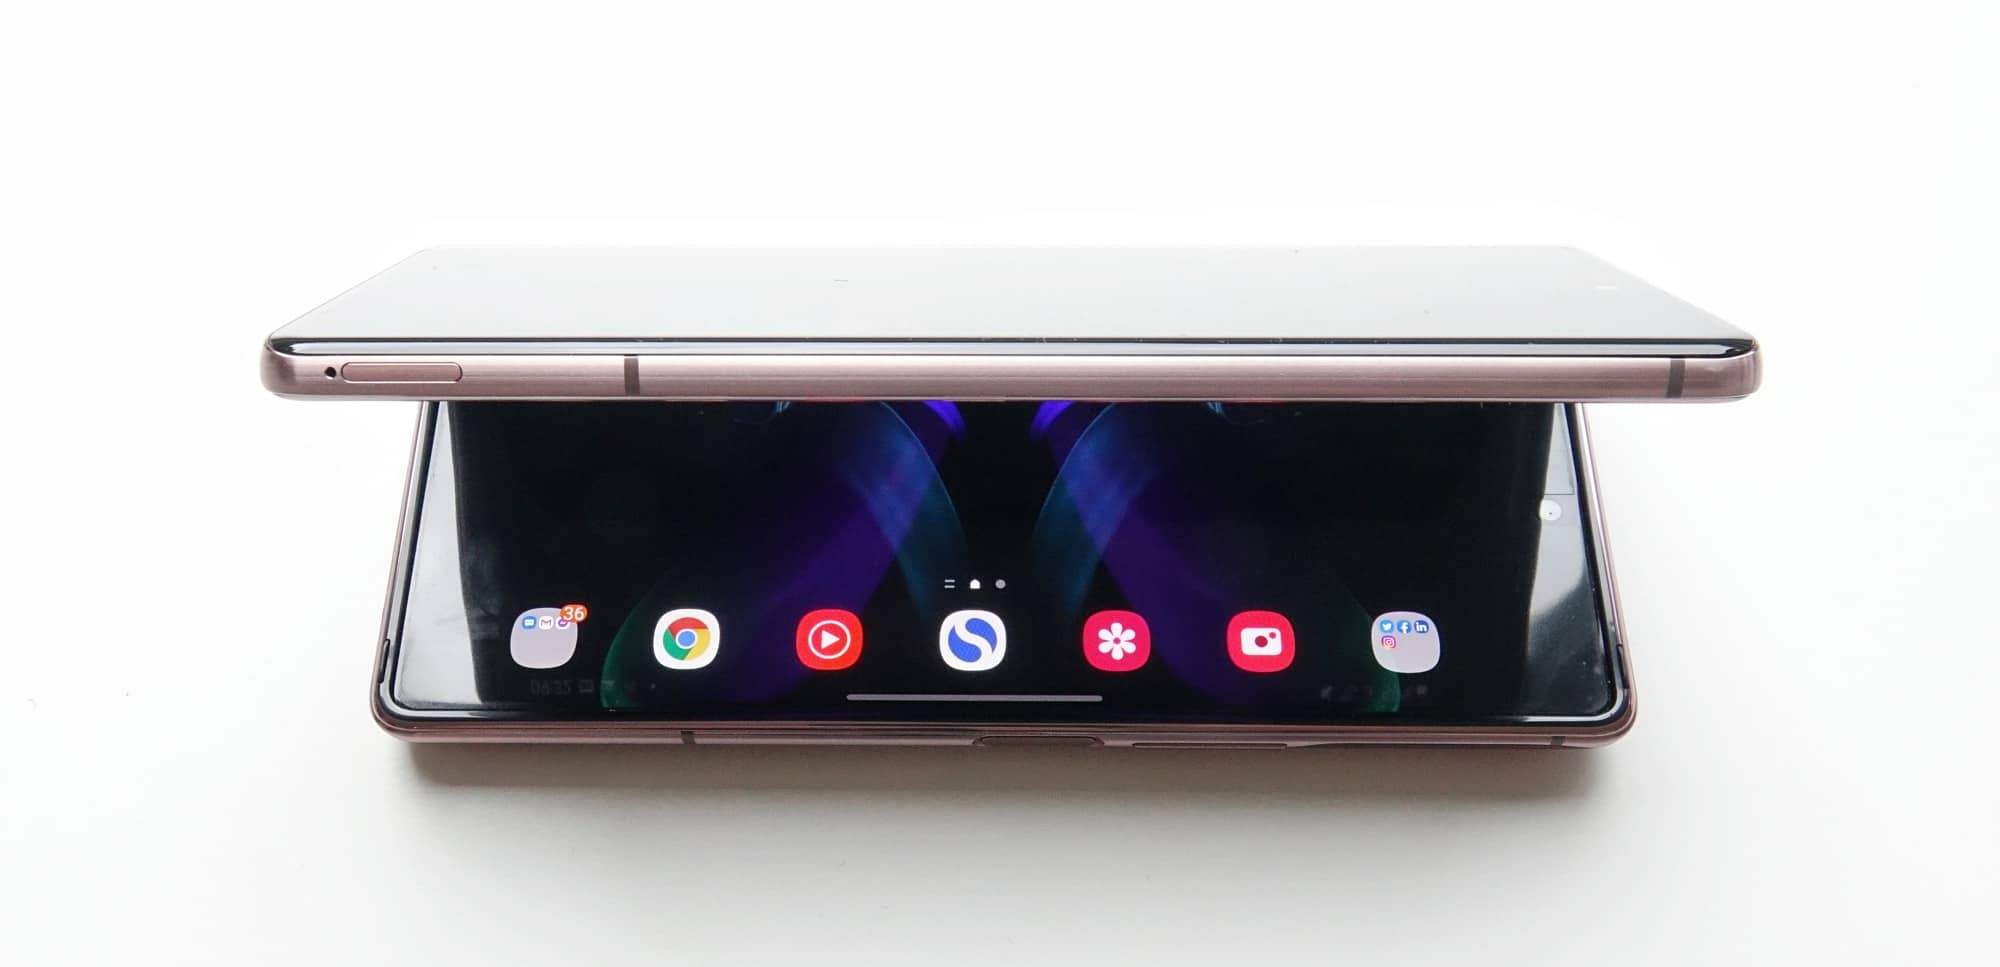 Samsung Galaxy Z Fold 2 reviewed